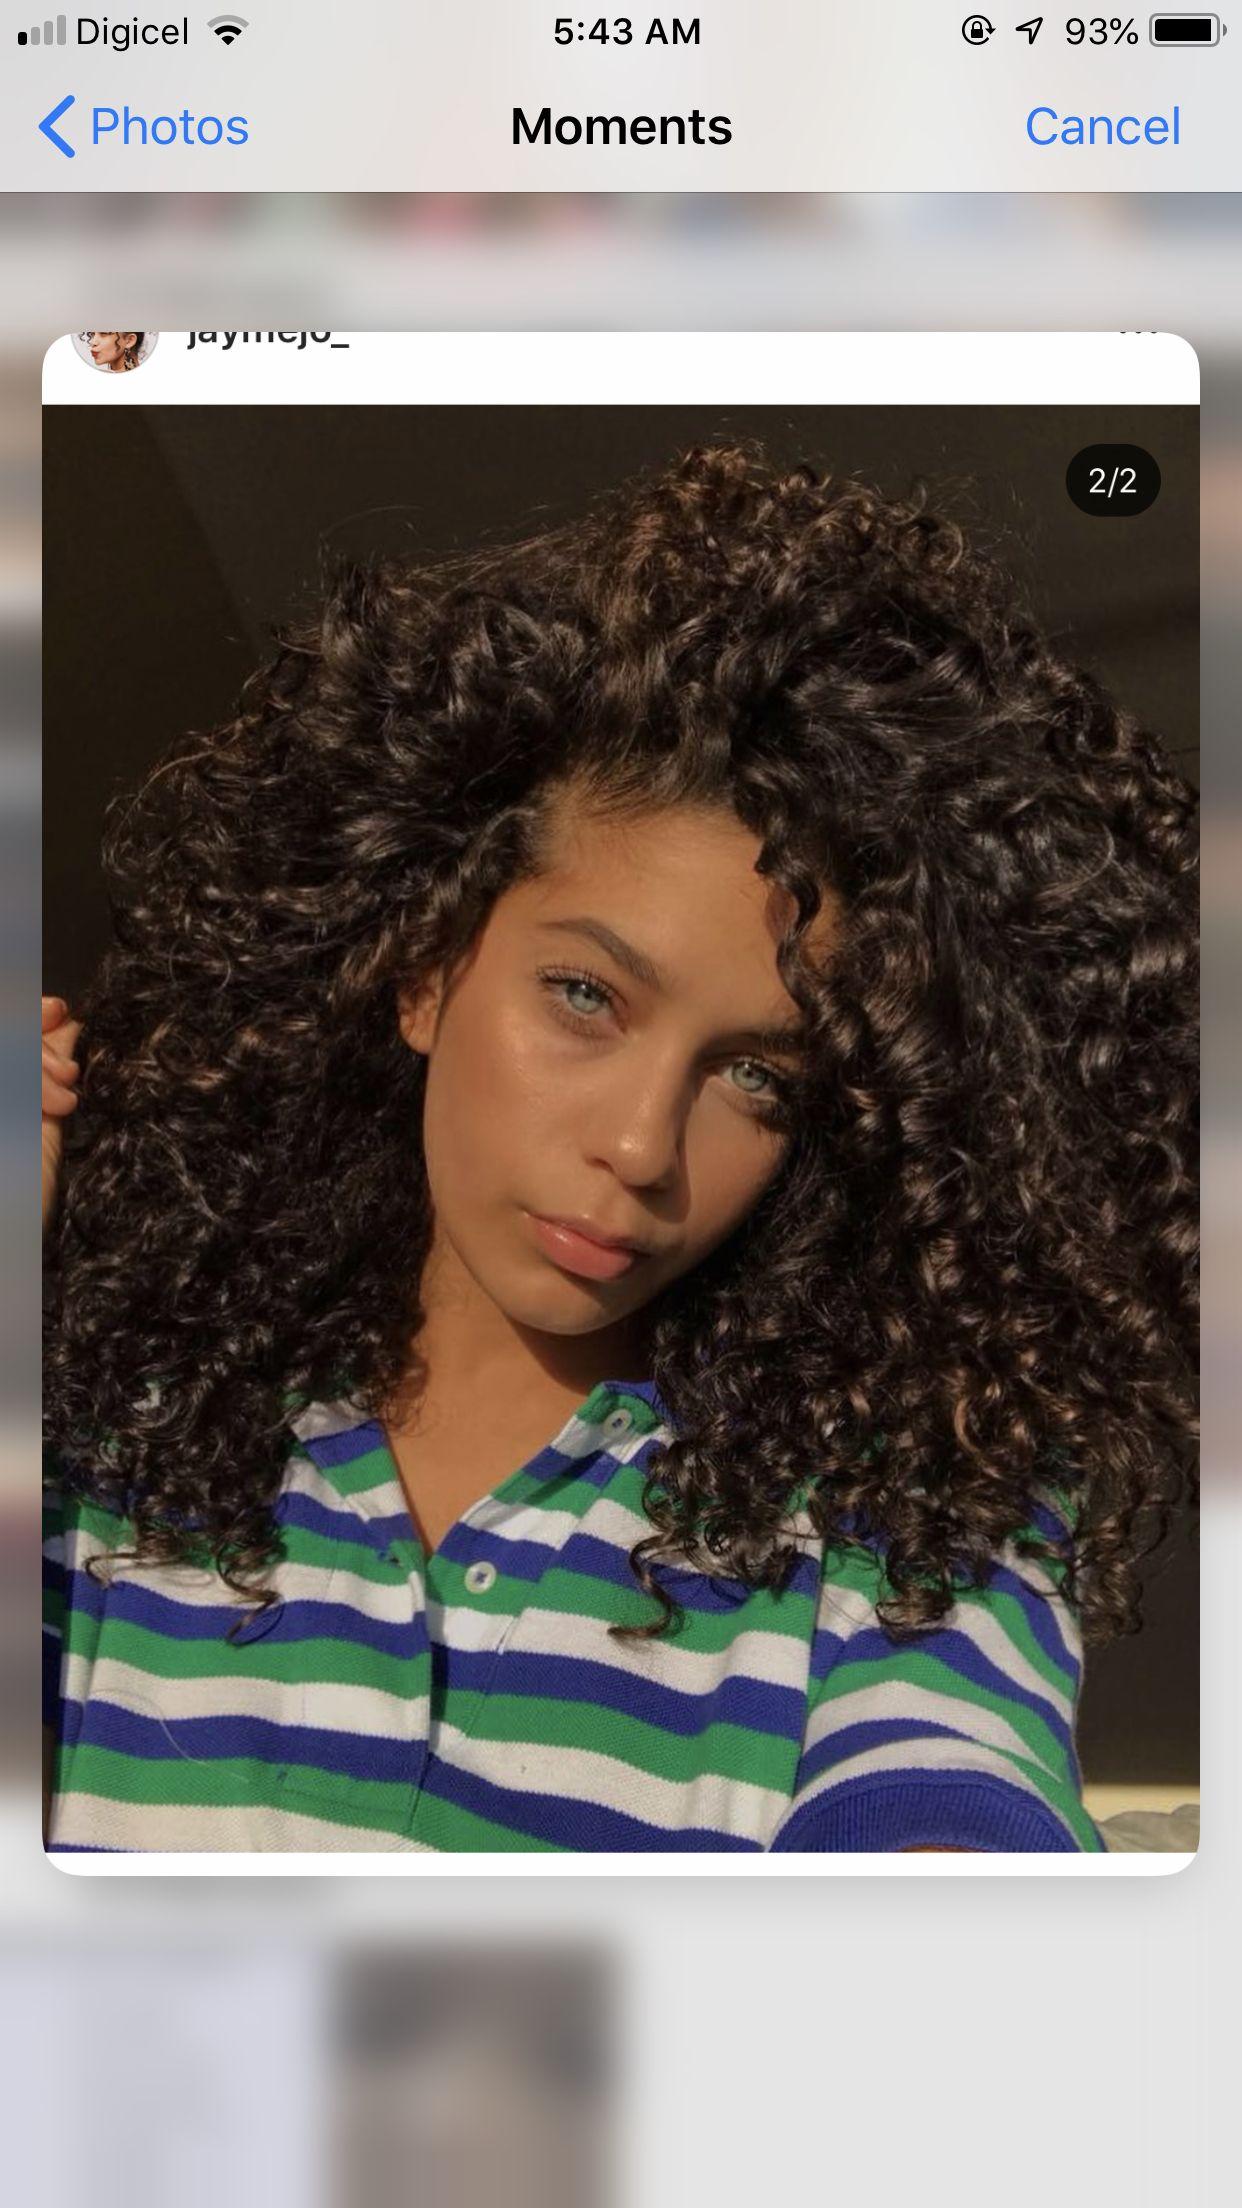 Jay Mejo Curly Dark Brown Hair Light Skin Girls Curly Girl Hairstyles Light Skin